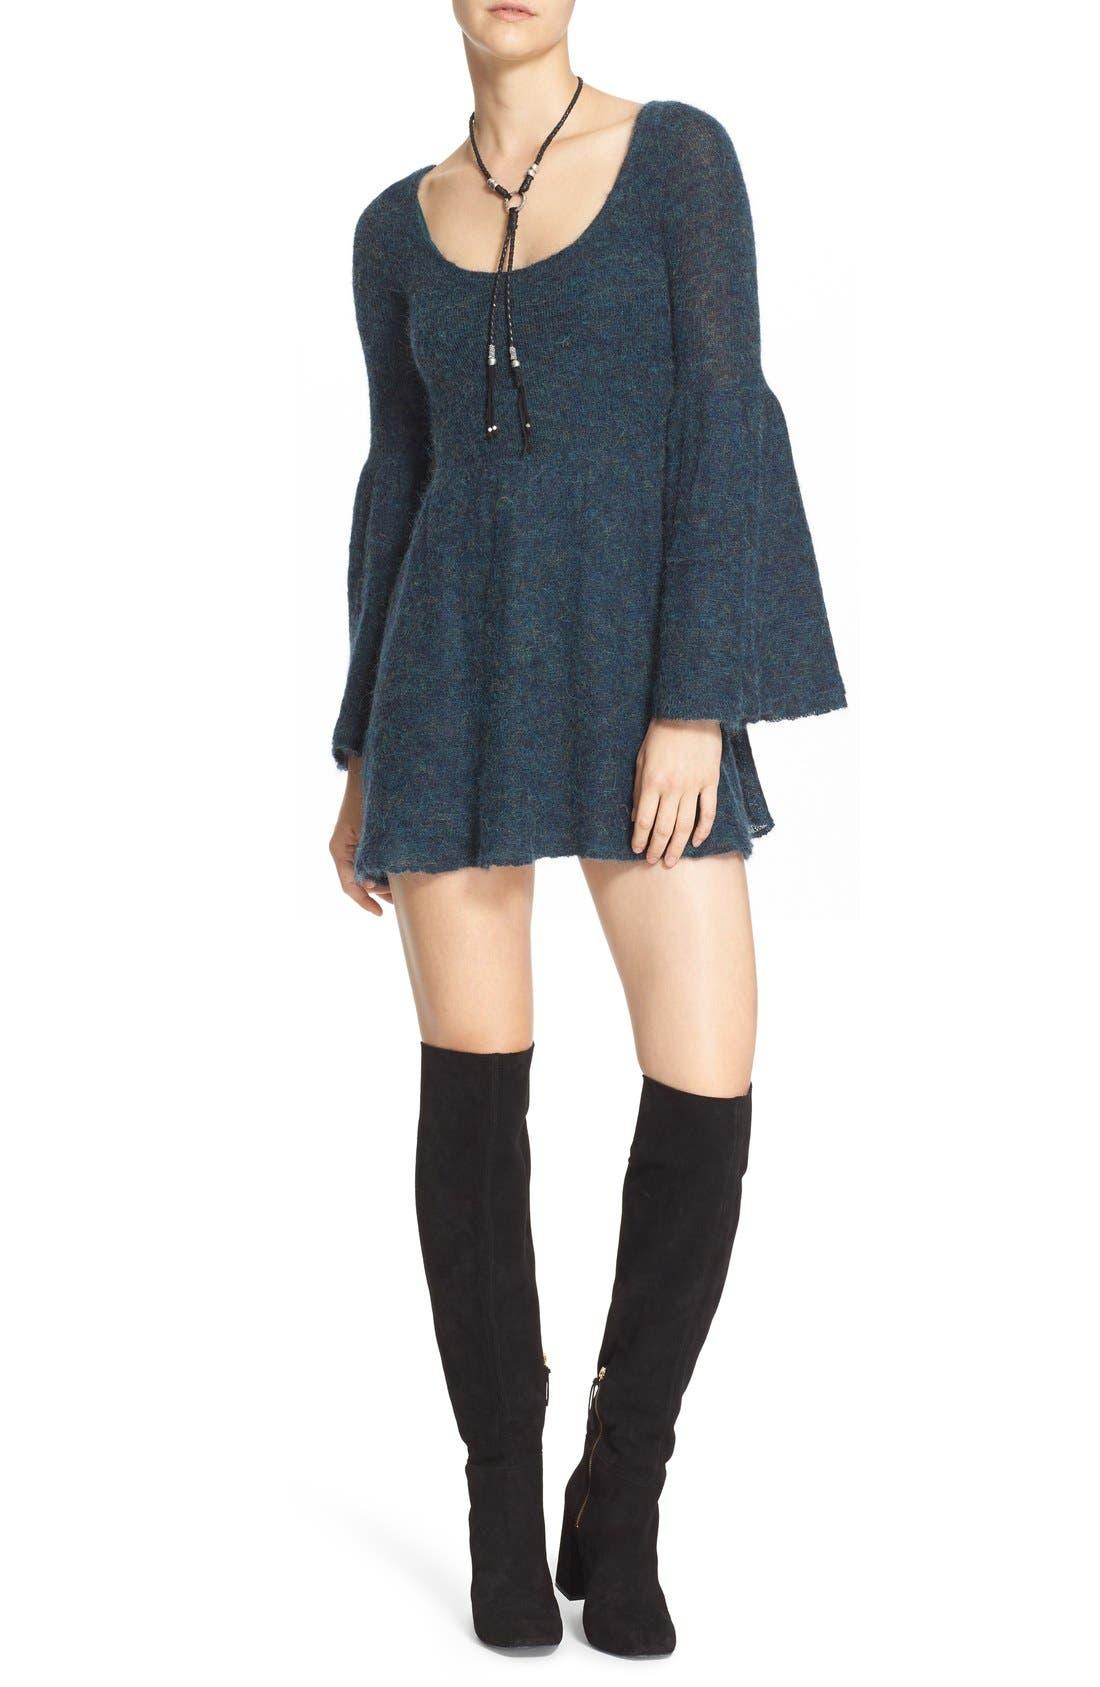 Main Image - Free People 'Juliet' Babydoll Sweater Dress